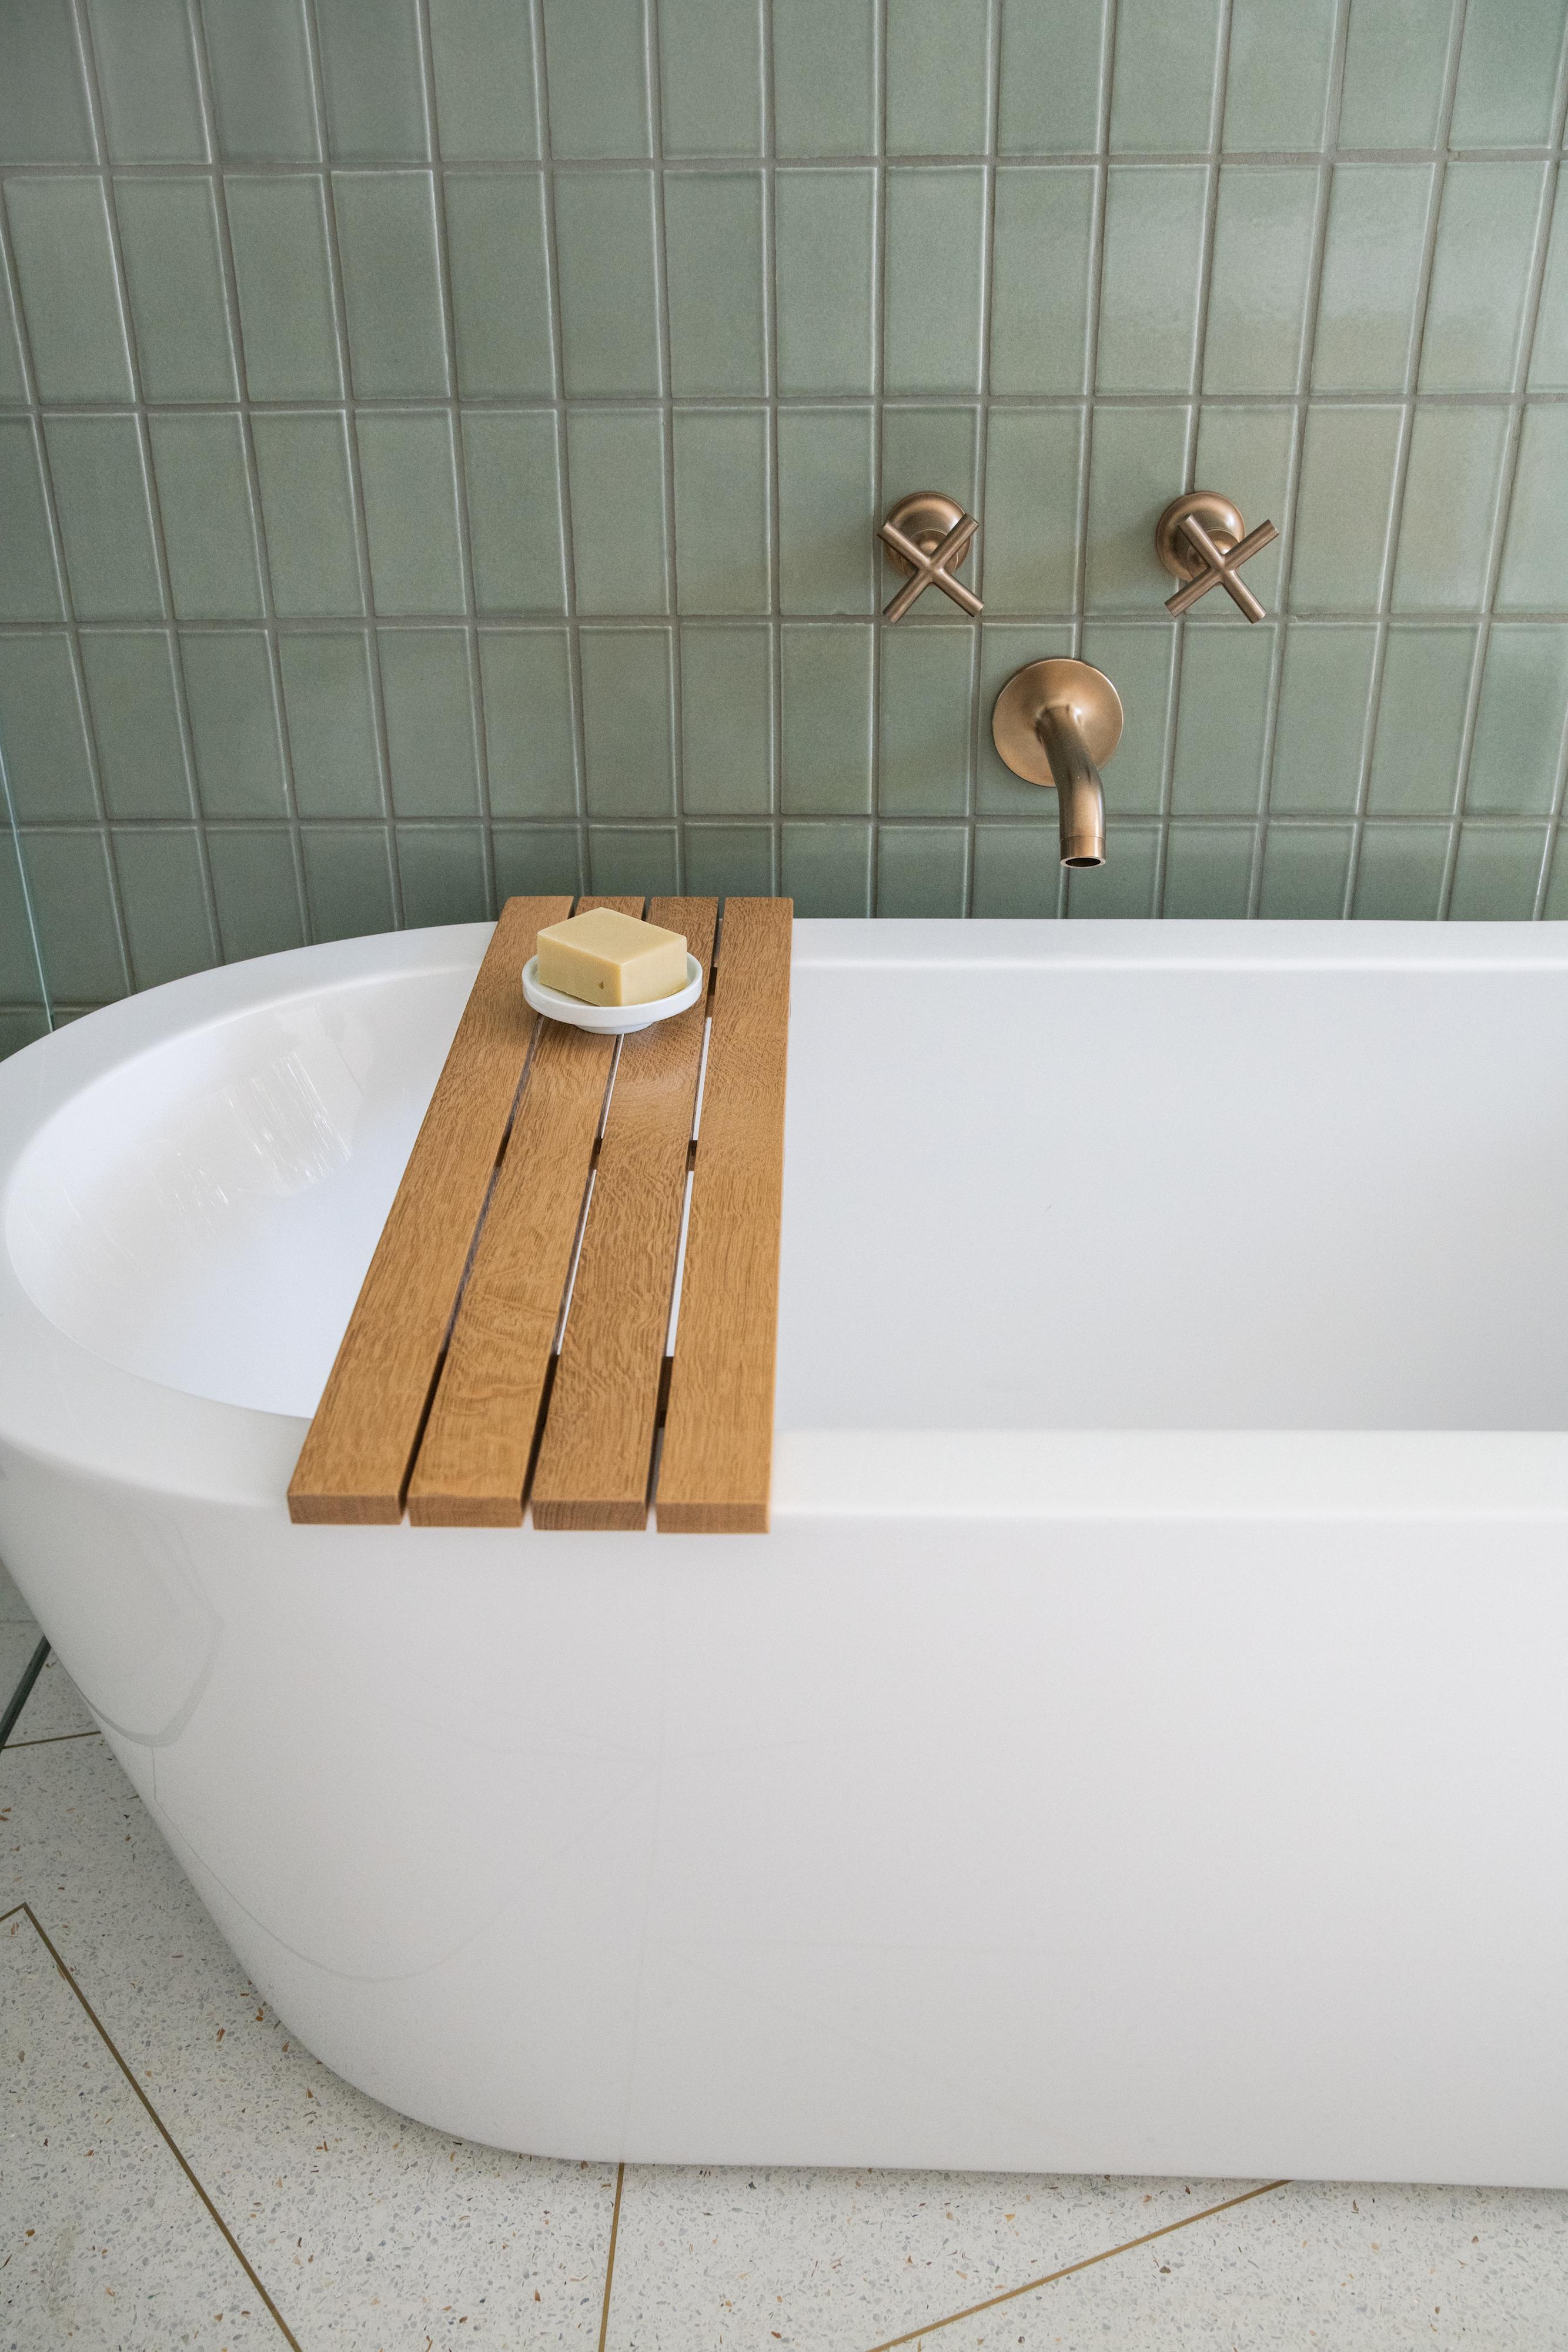 Mandy Moore's Fireclay Rosemary Bathroom